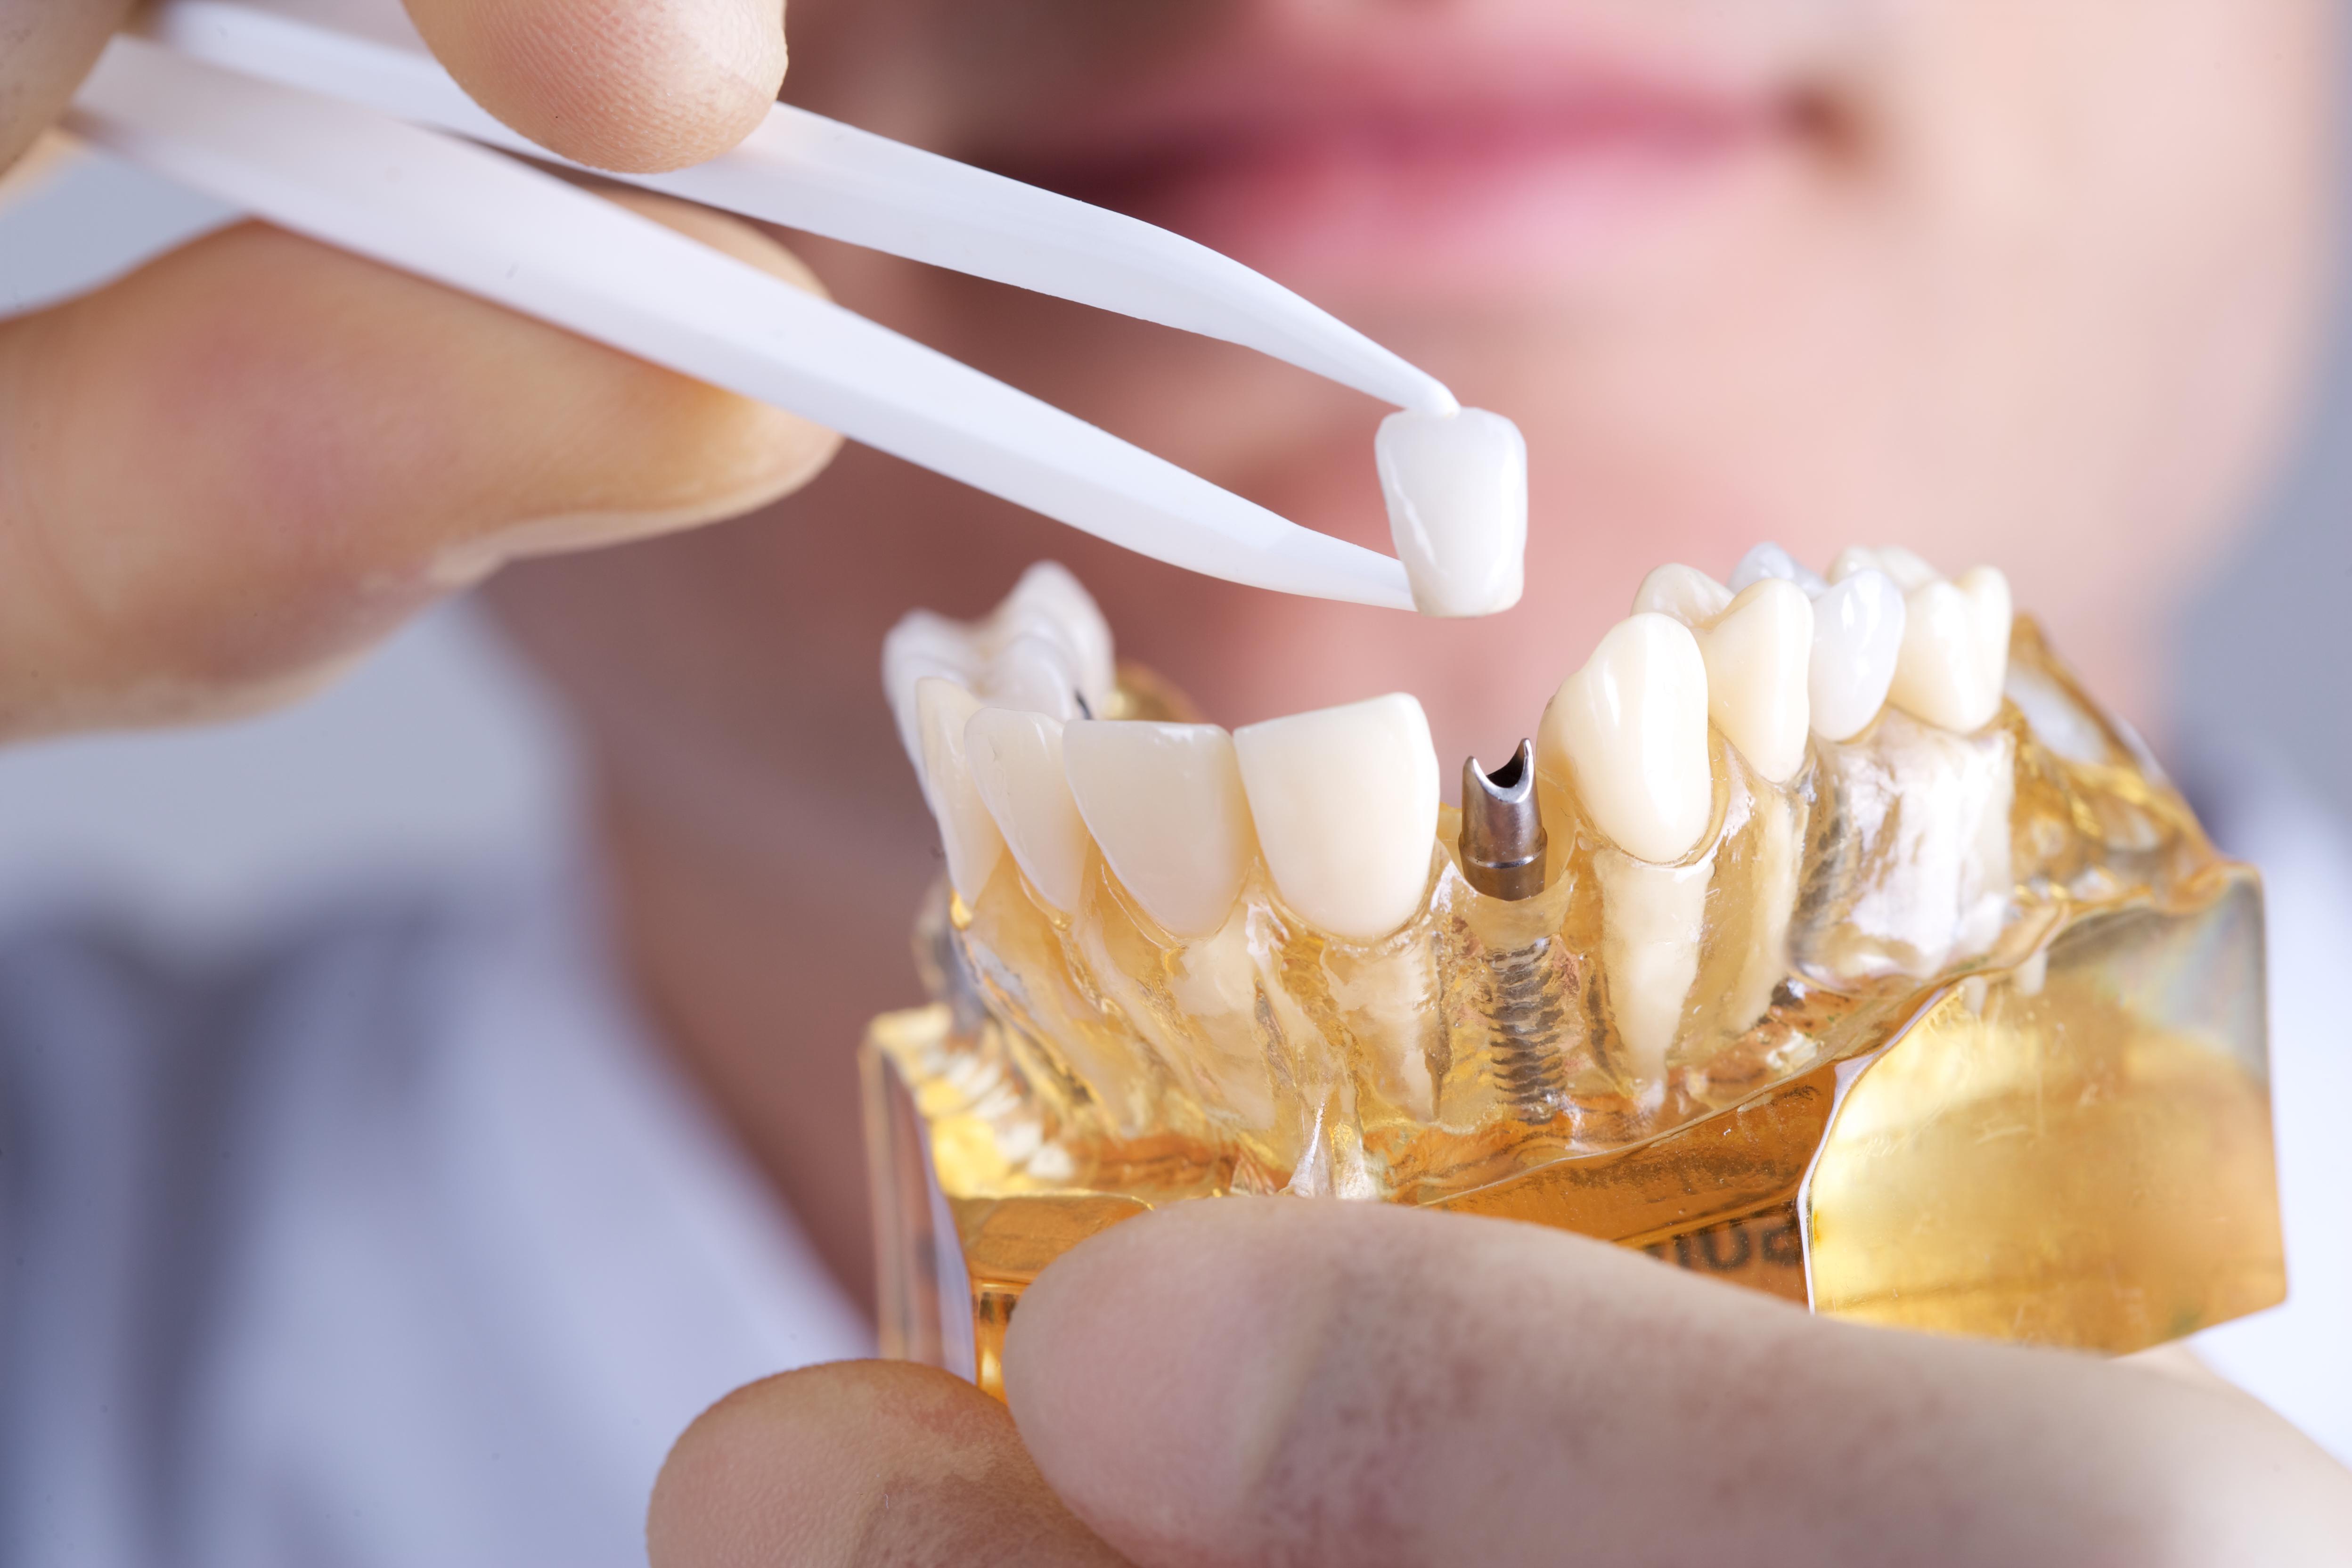 Prótesis: Servicios de Clínica Dental Irudent